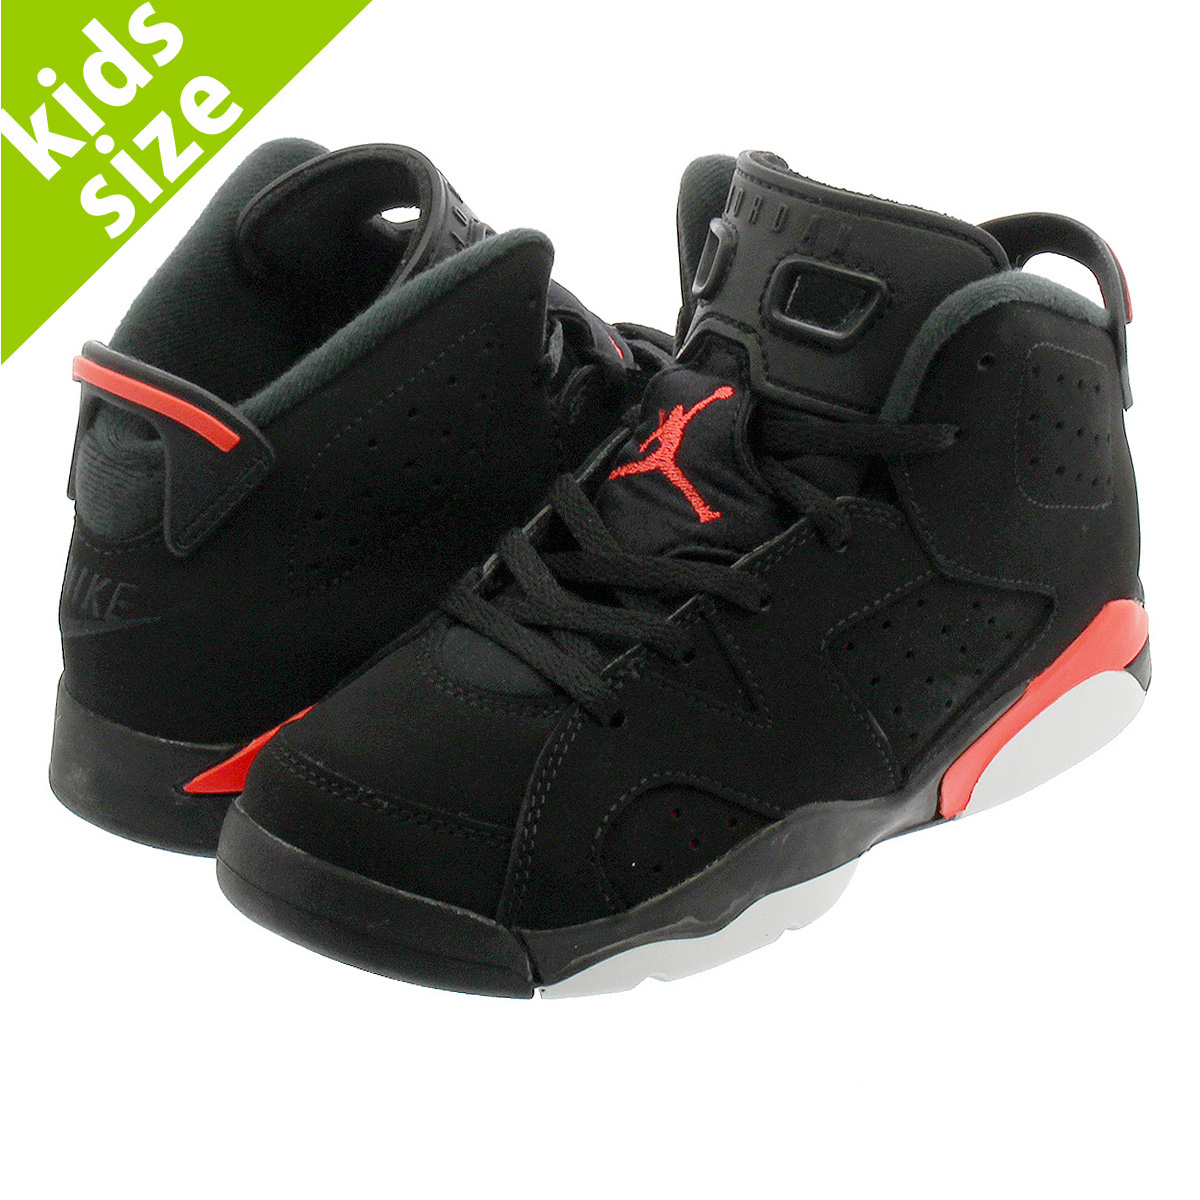 e58a551f8f7 NIKE AIR JORDAN 6 RETRO BP Nike Air Jordan 6 nostalgic BP BLACK/INFRARED  384,666 ...